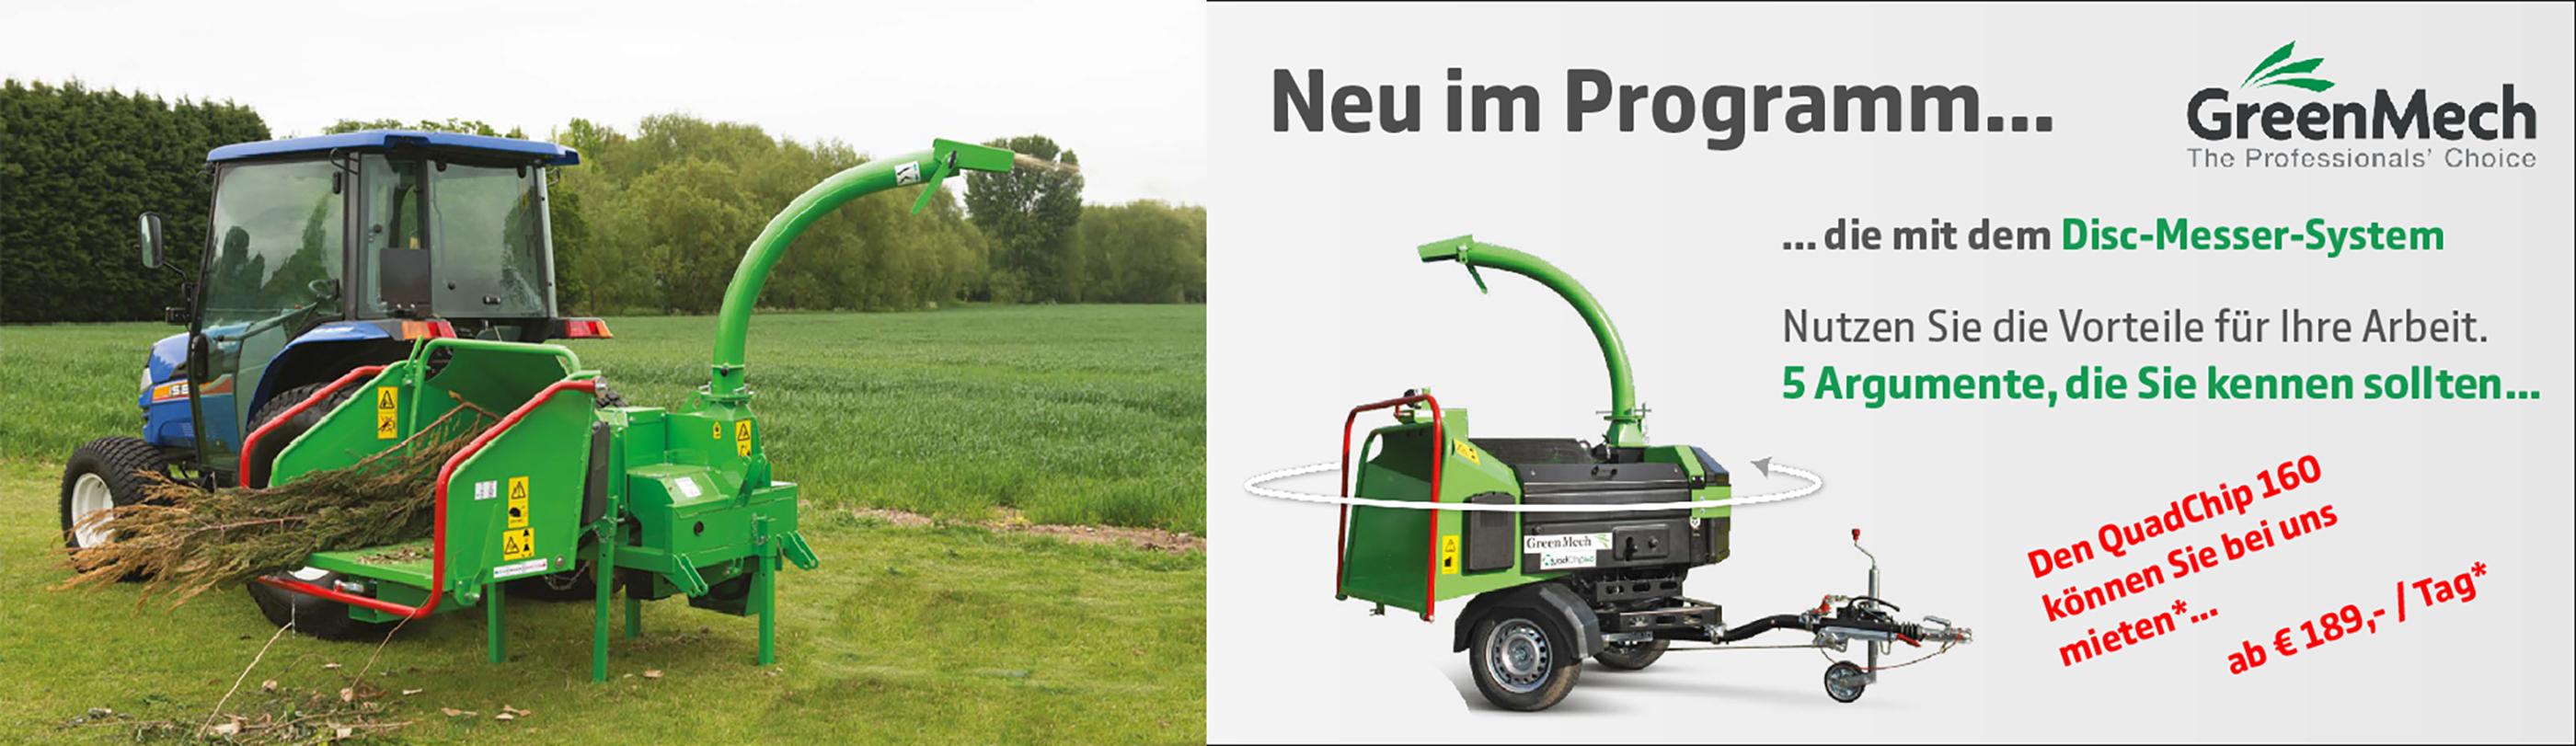 GreenMech Holzhäcksler  Slider Programmübersicht